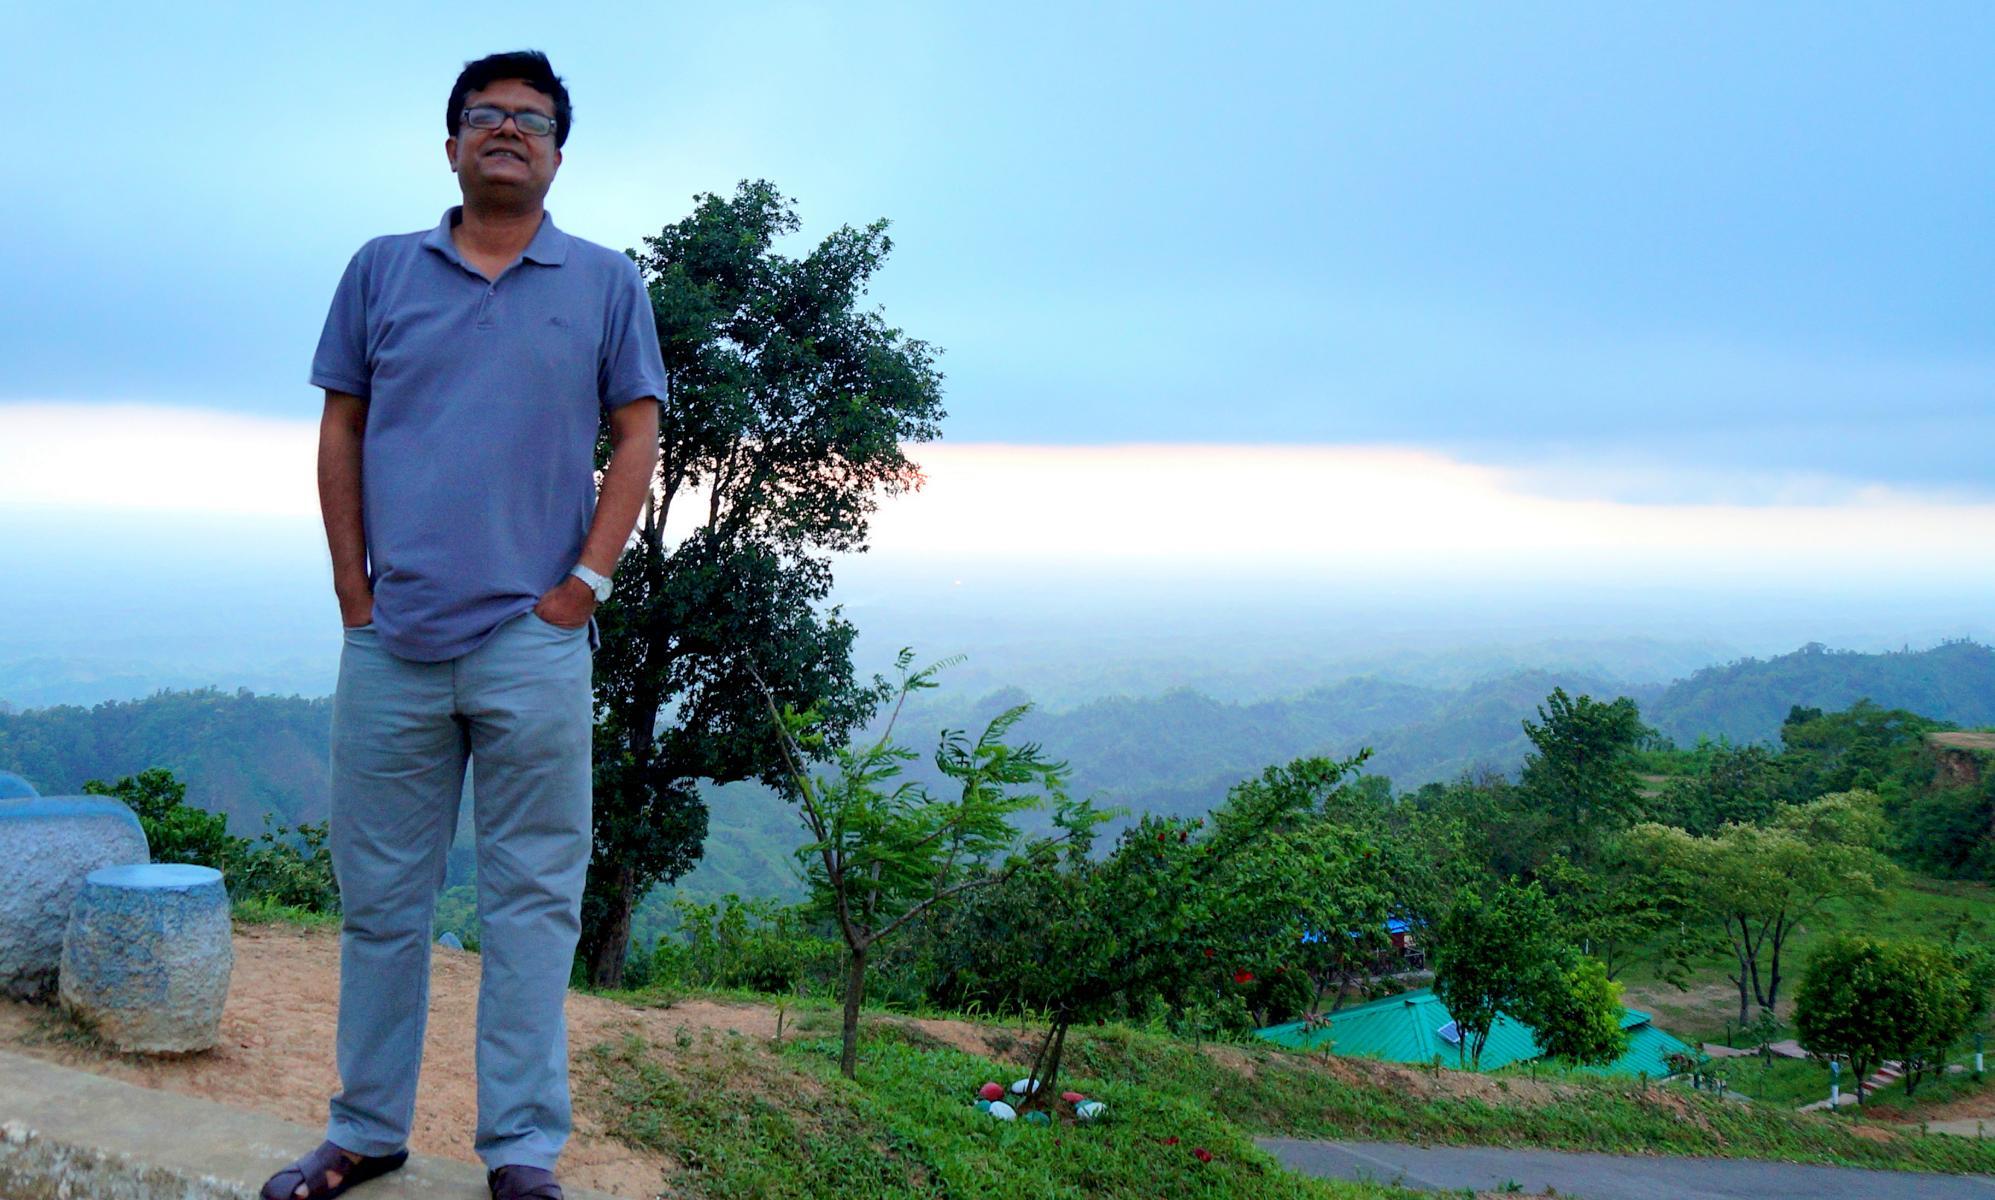 Monzur Huq on sustainable tourism